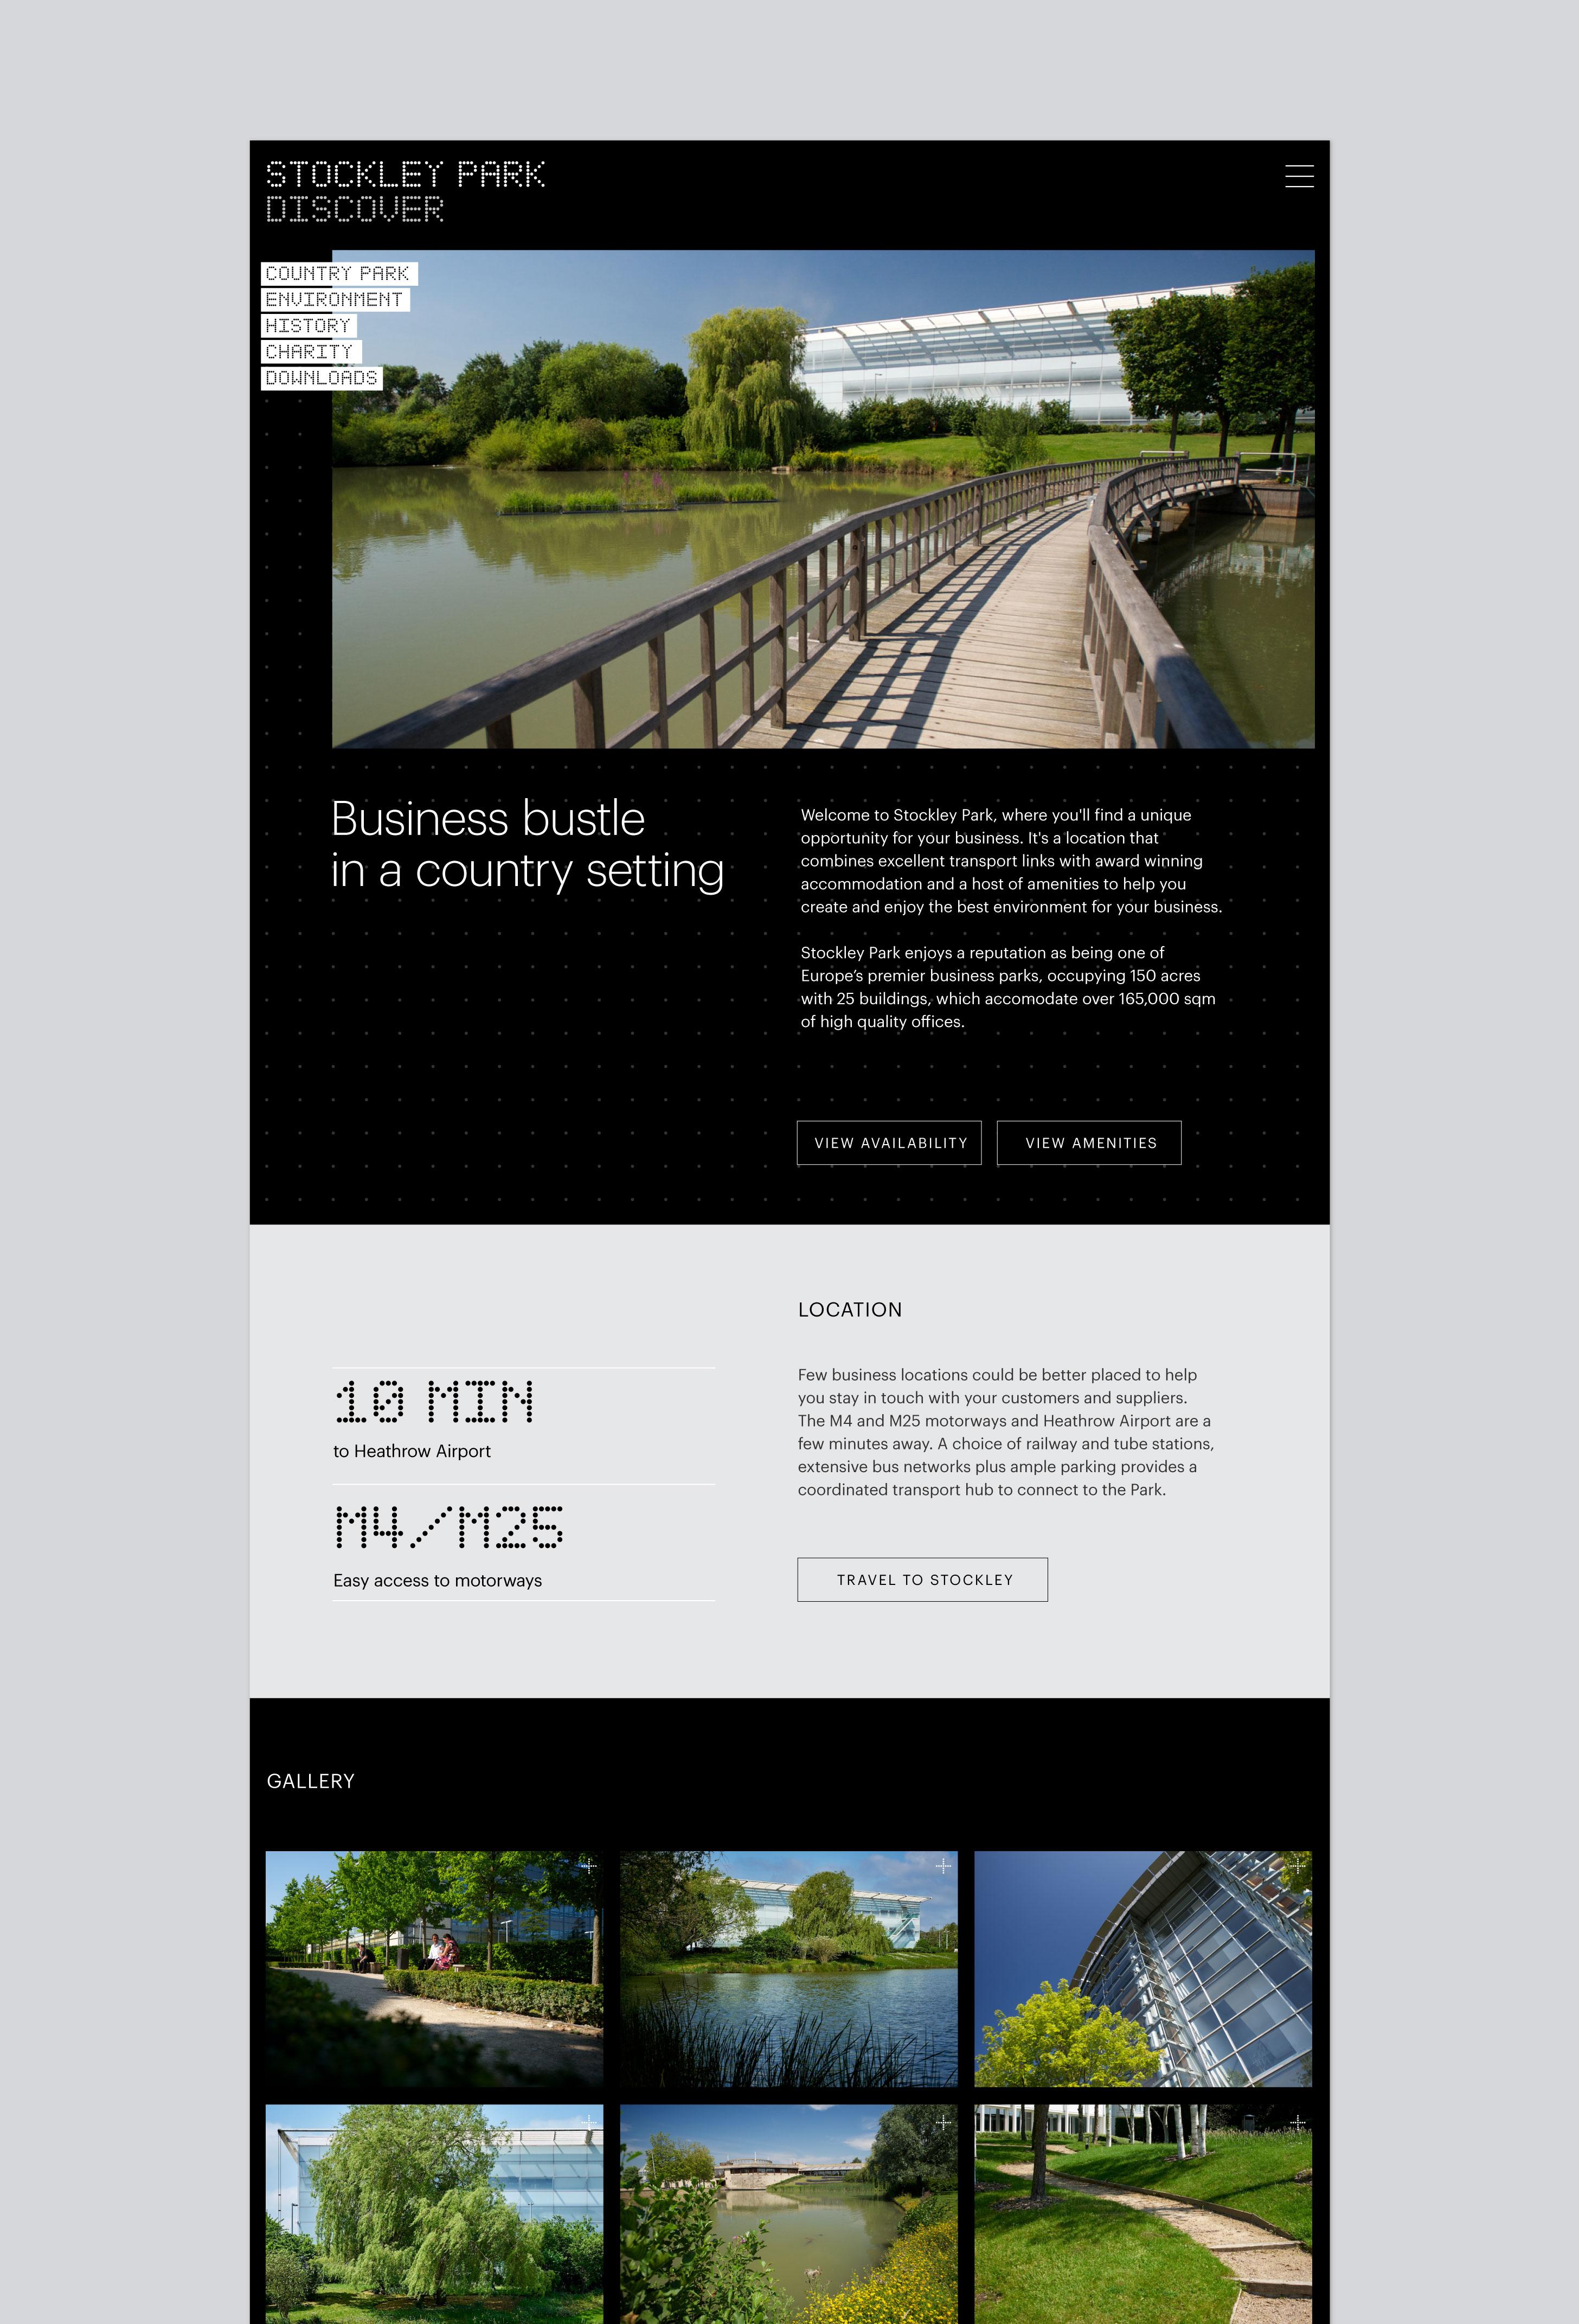 stockley park website discover